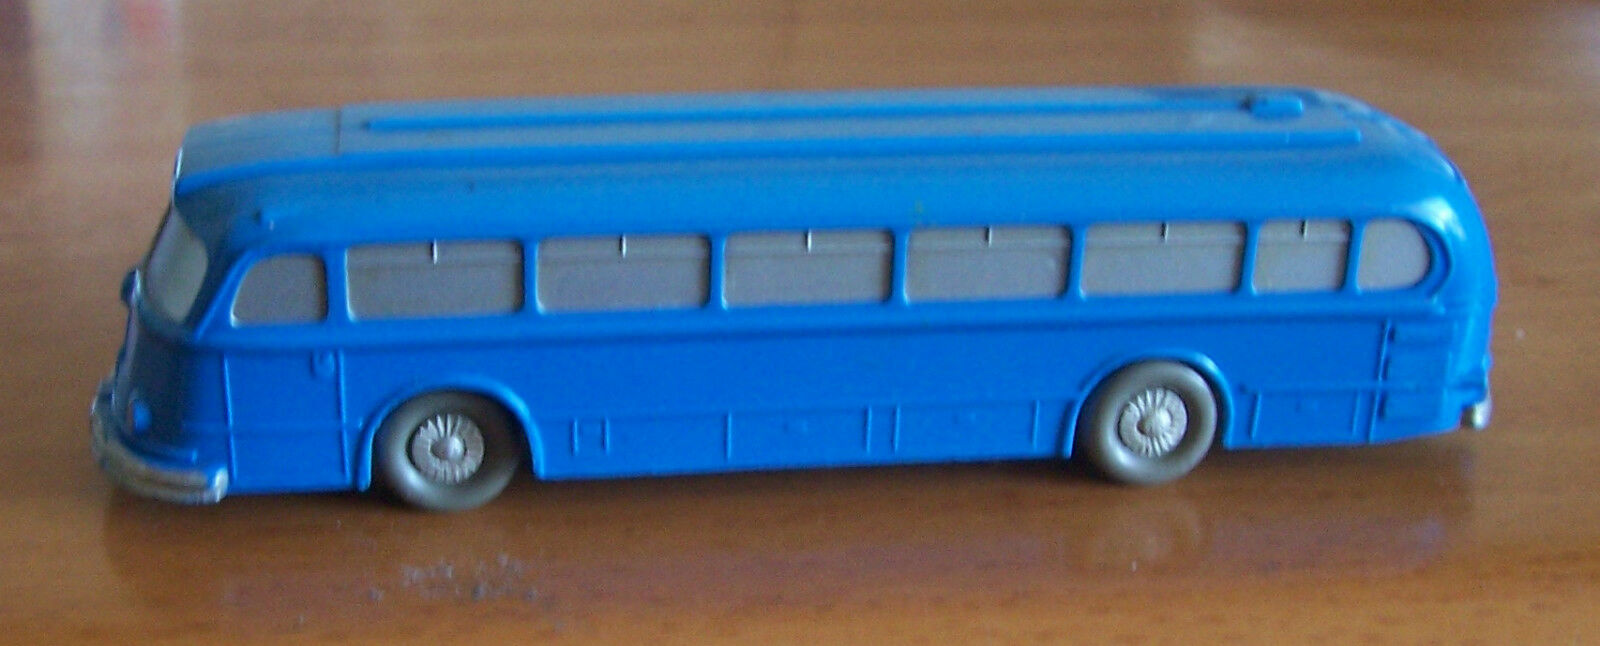 Wiking Germania vintage 1950s Bus blu smaltato HO in plastica